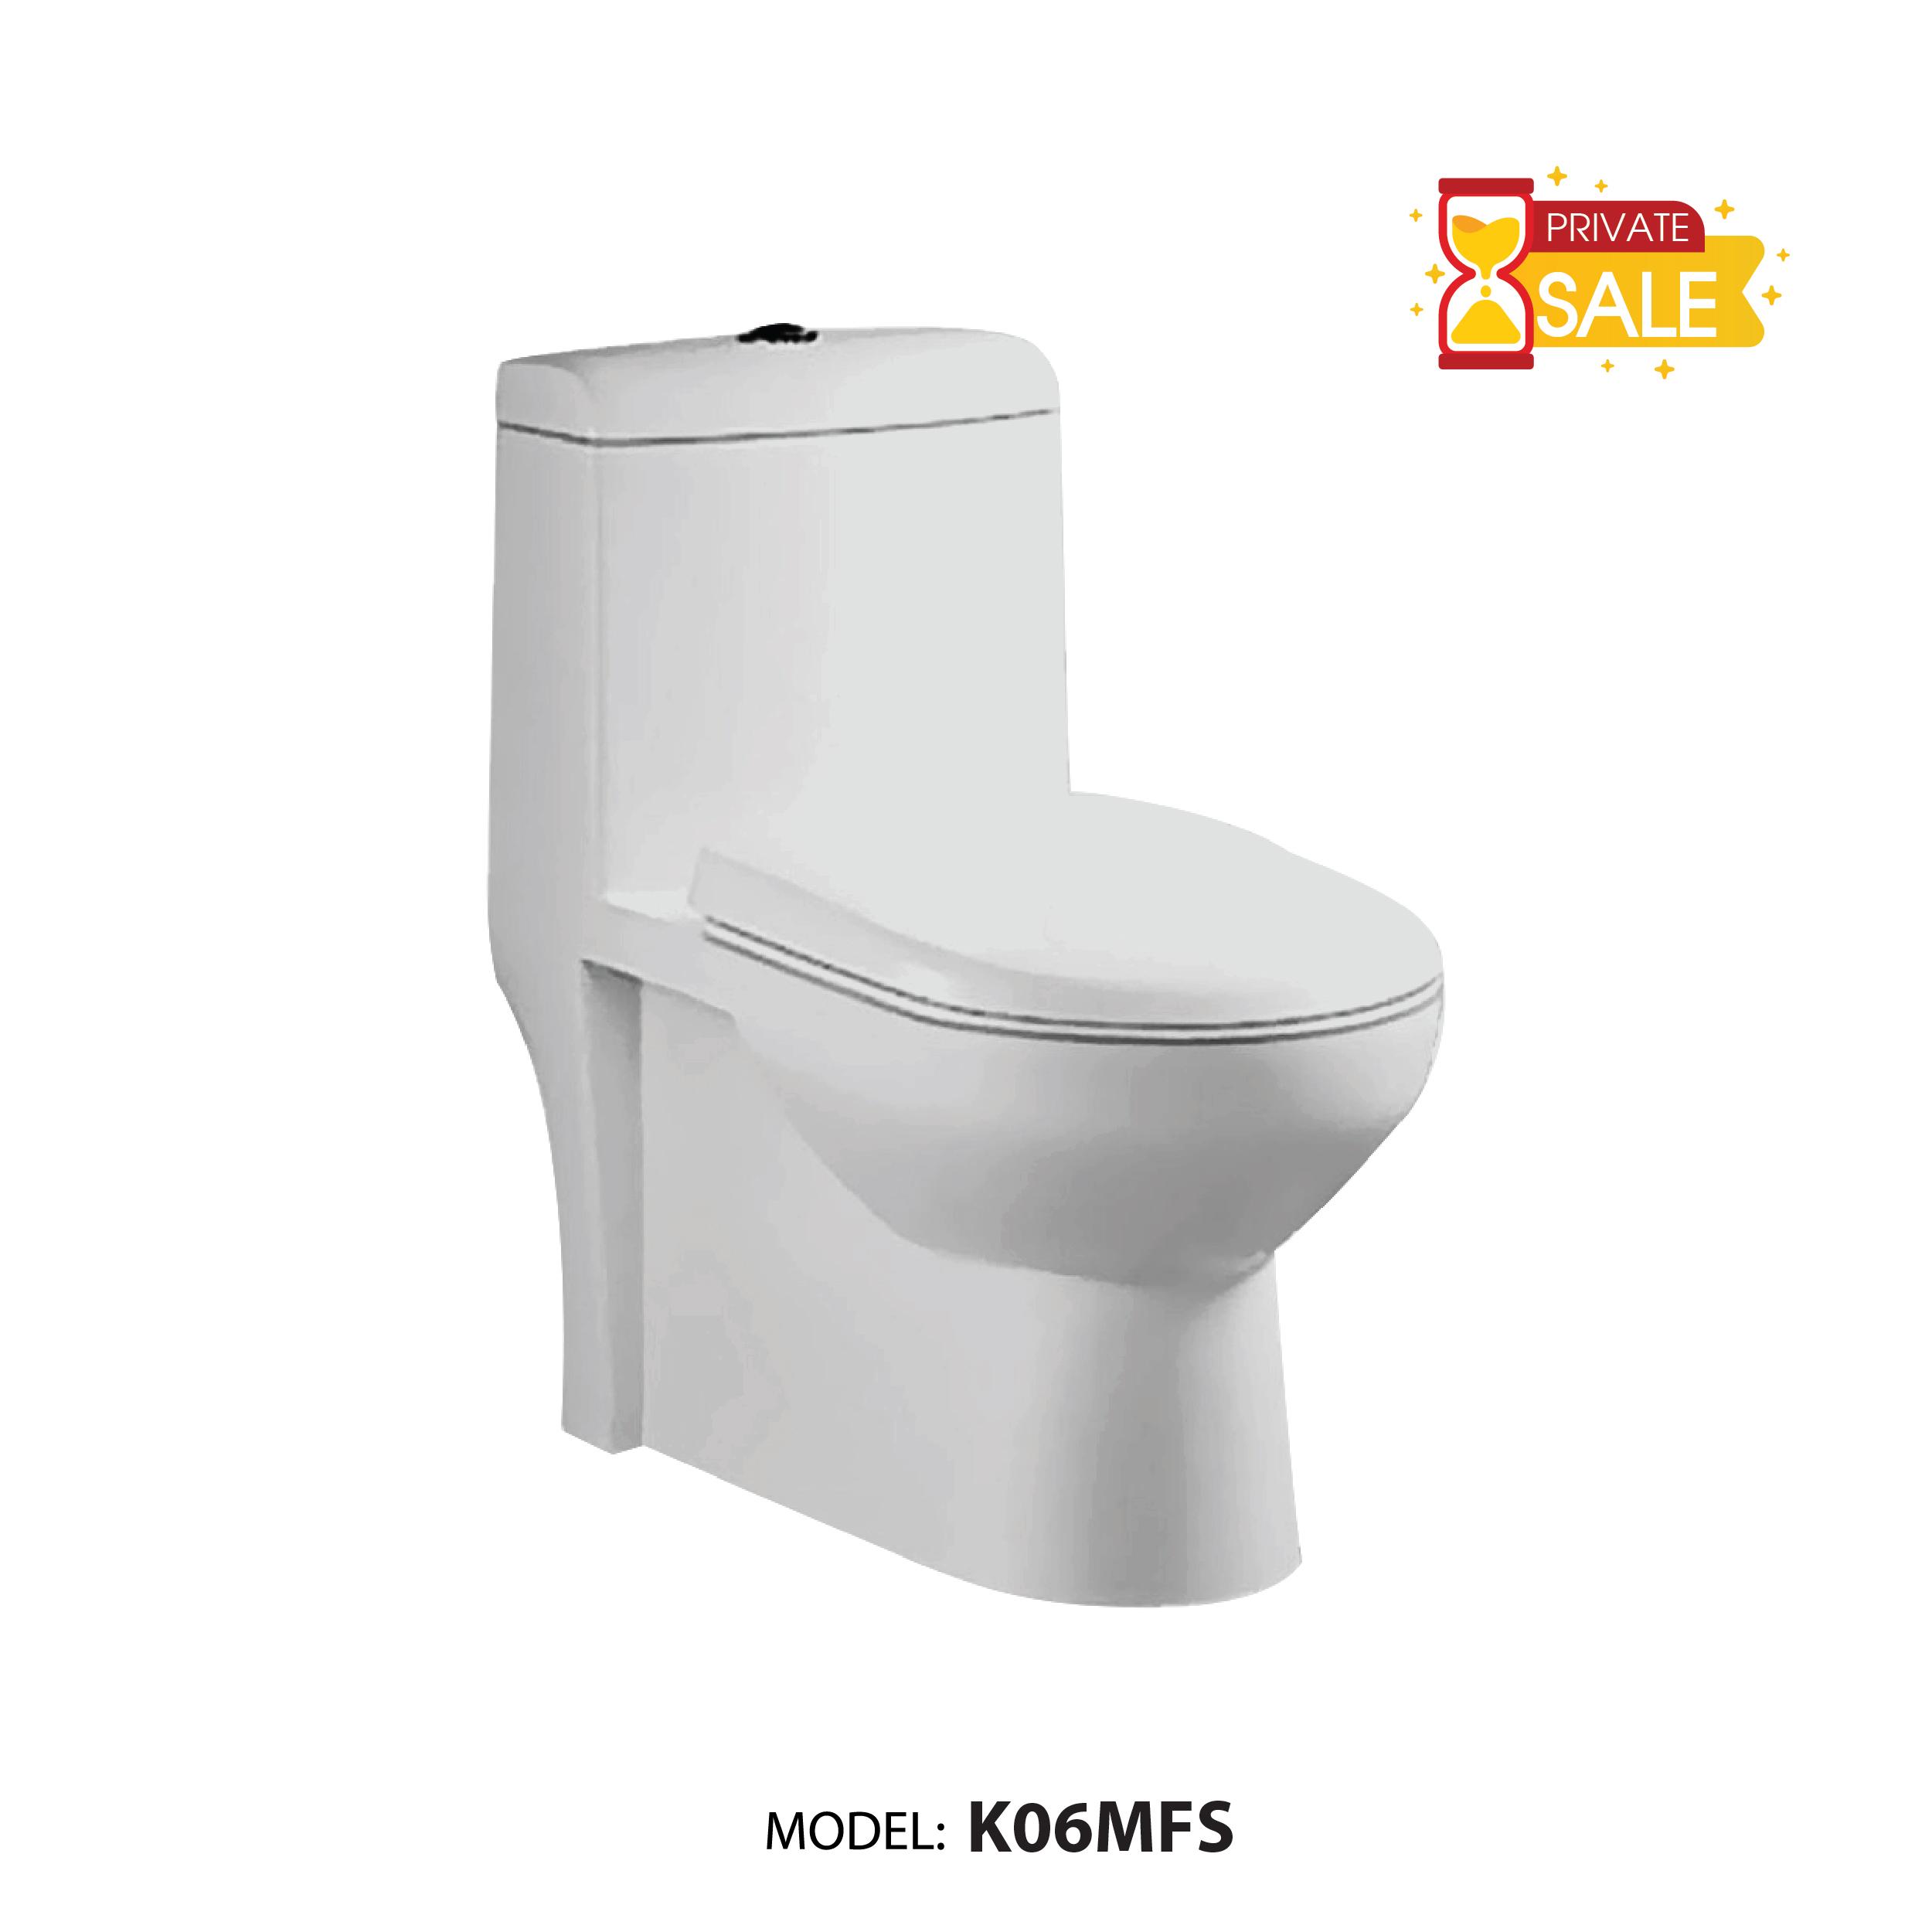 BỒN CẦU 1 KHỐI CARANO MODEL K06MFS (MODEL: K06MFS)